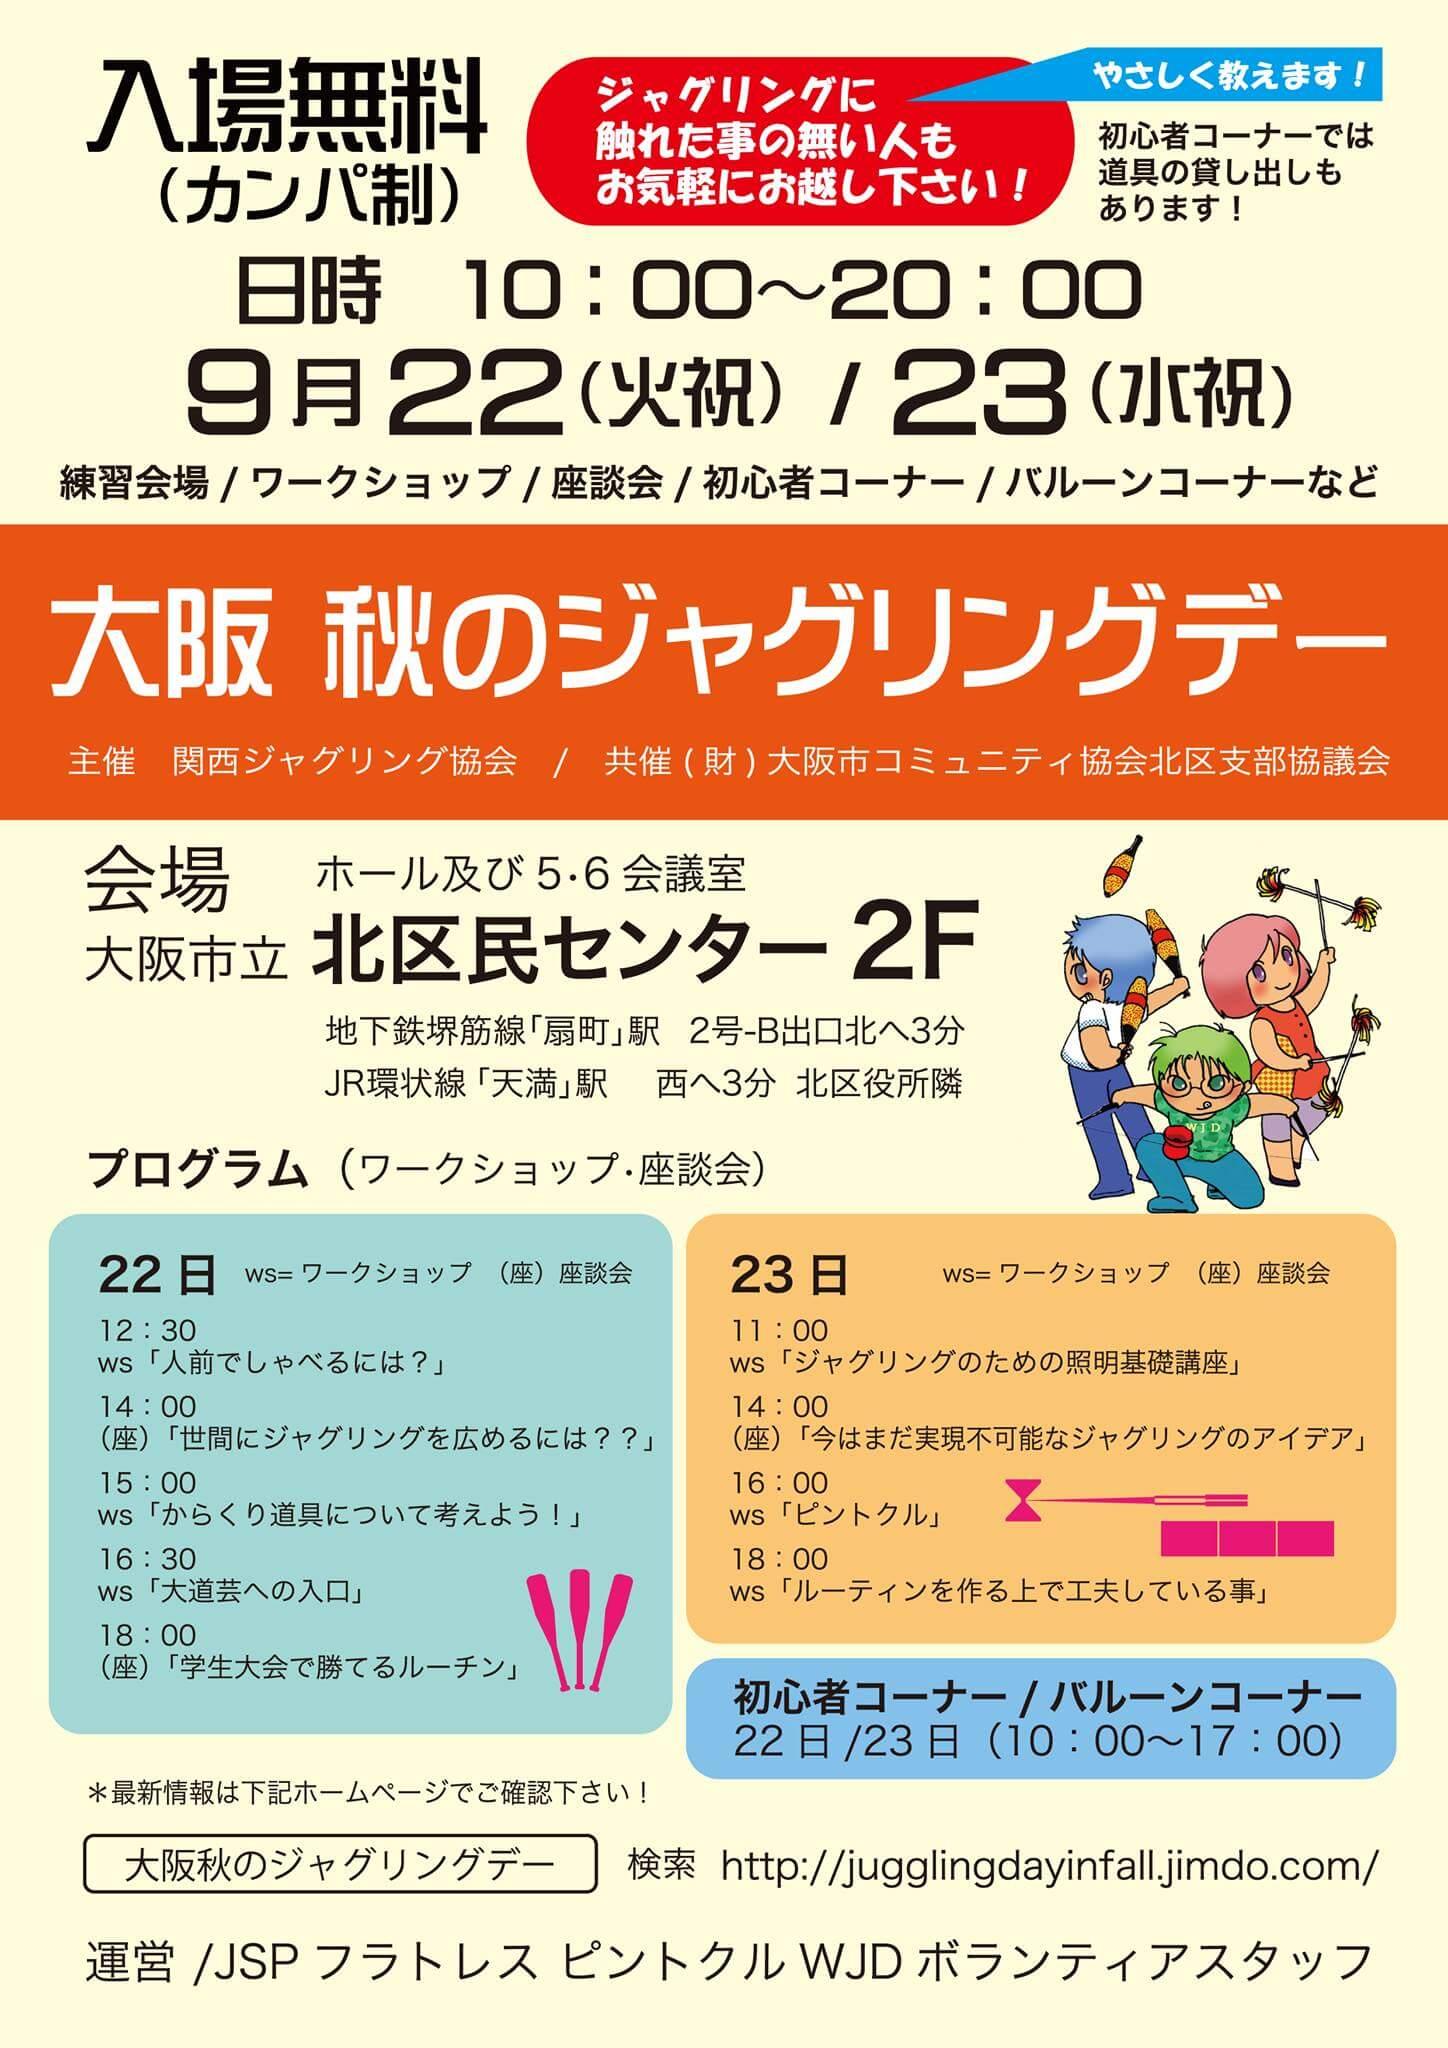 ( C ) 関西ジャグリング協会 http://jugglingdayinfall.jimdo.com/おまけ/